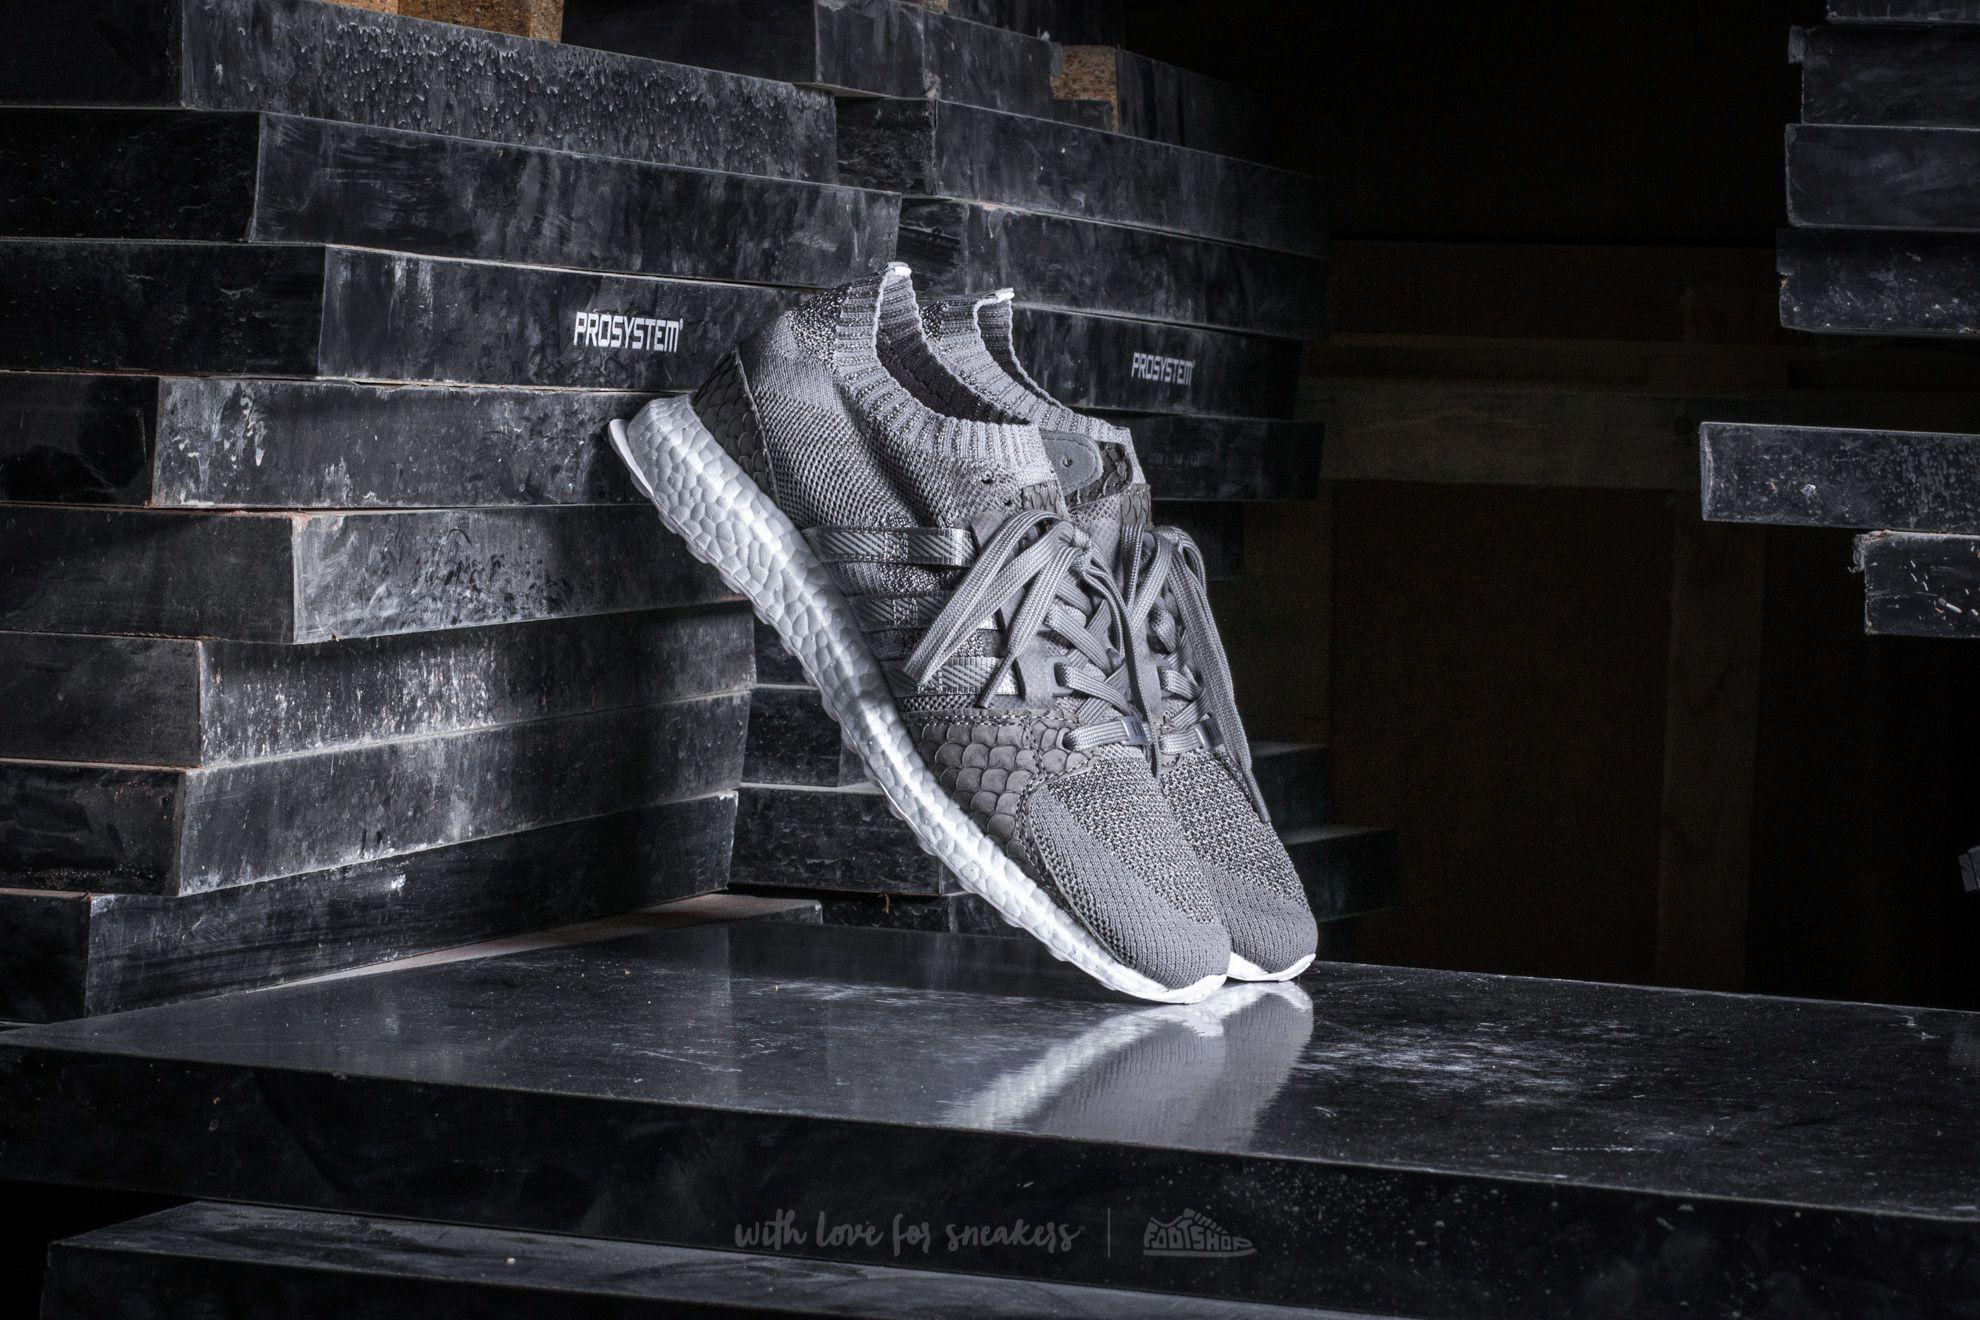 Pánské tenisky a boty adidas x King Push Equipment Support Ultra Primeknit Stone/ Stone/ Stone